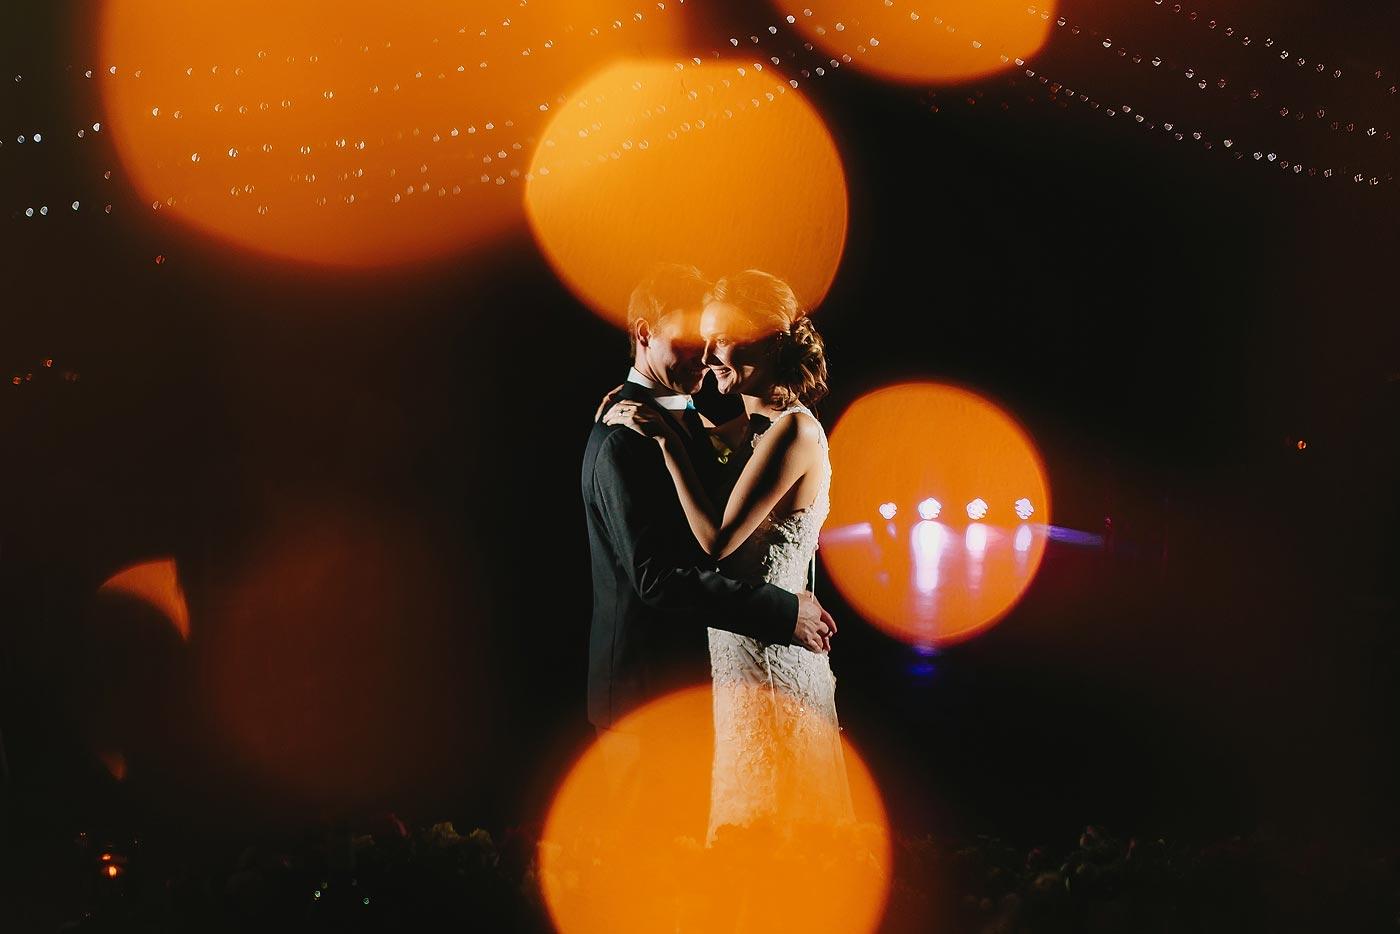 Creative Wedding First Dance Photo